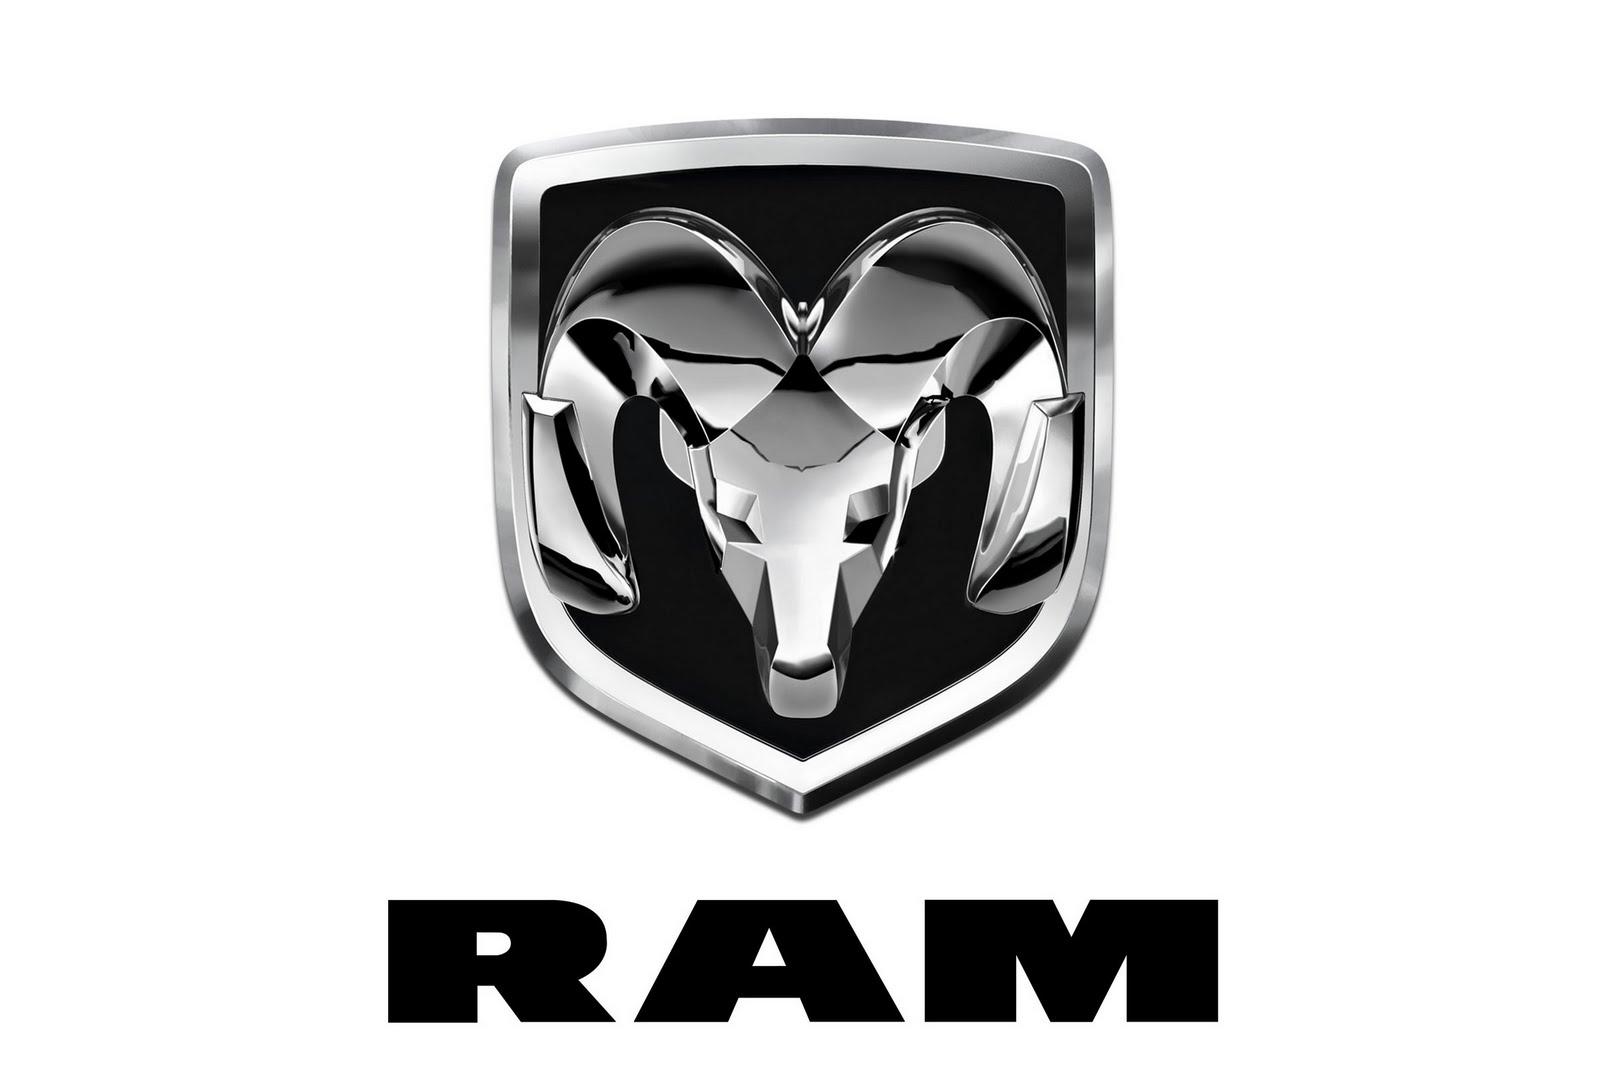 Dodge Ram Logo Wallpaper 5967 Hd Wallpapers in Logos   Imagescicom 1600x1067